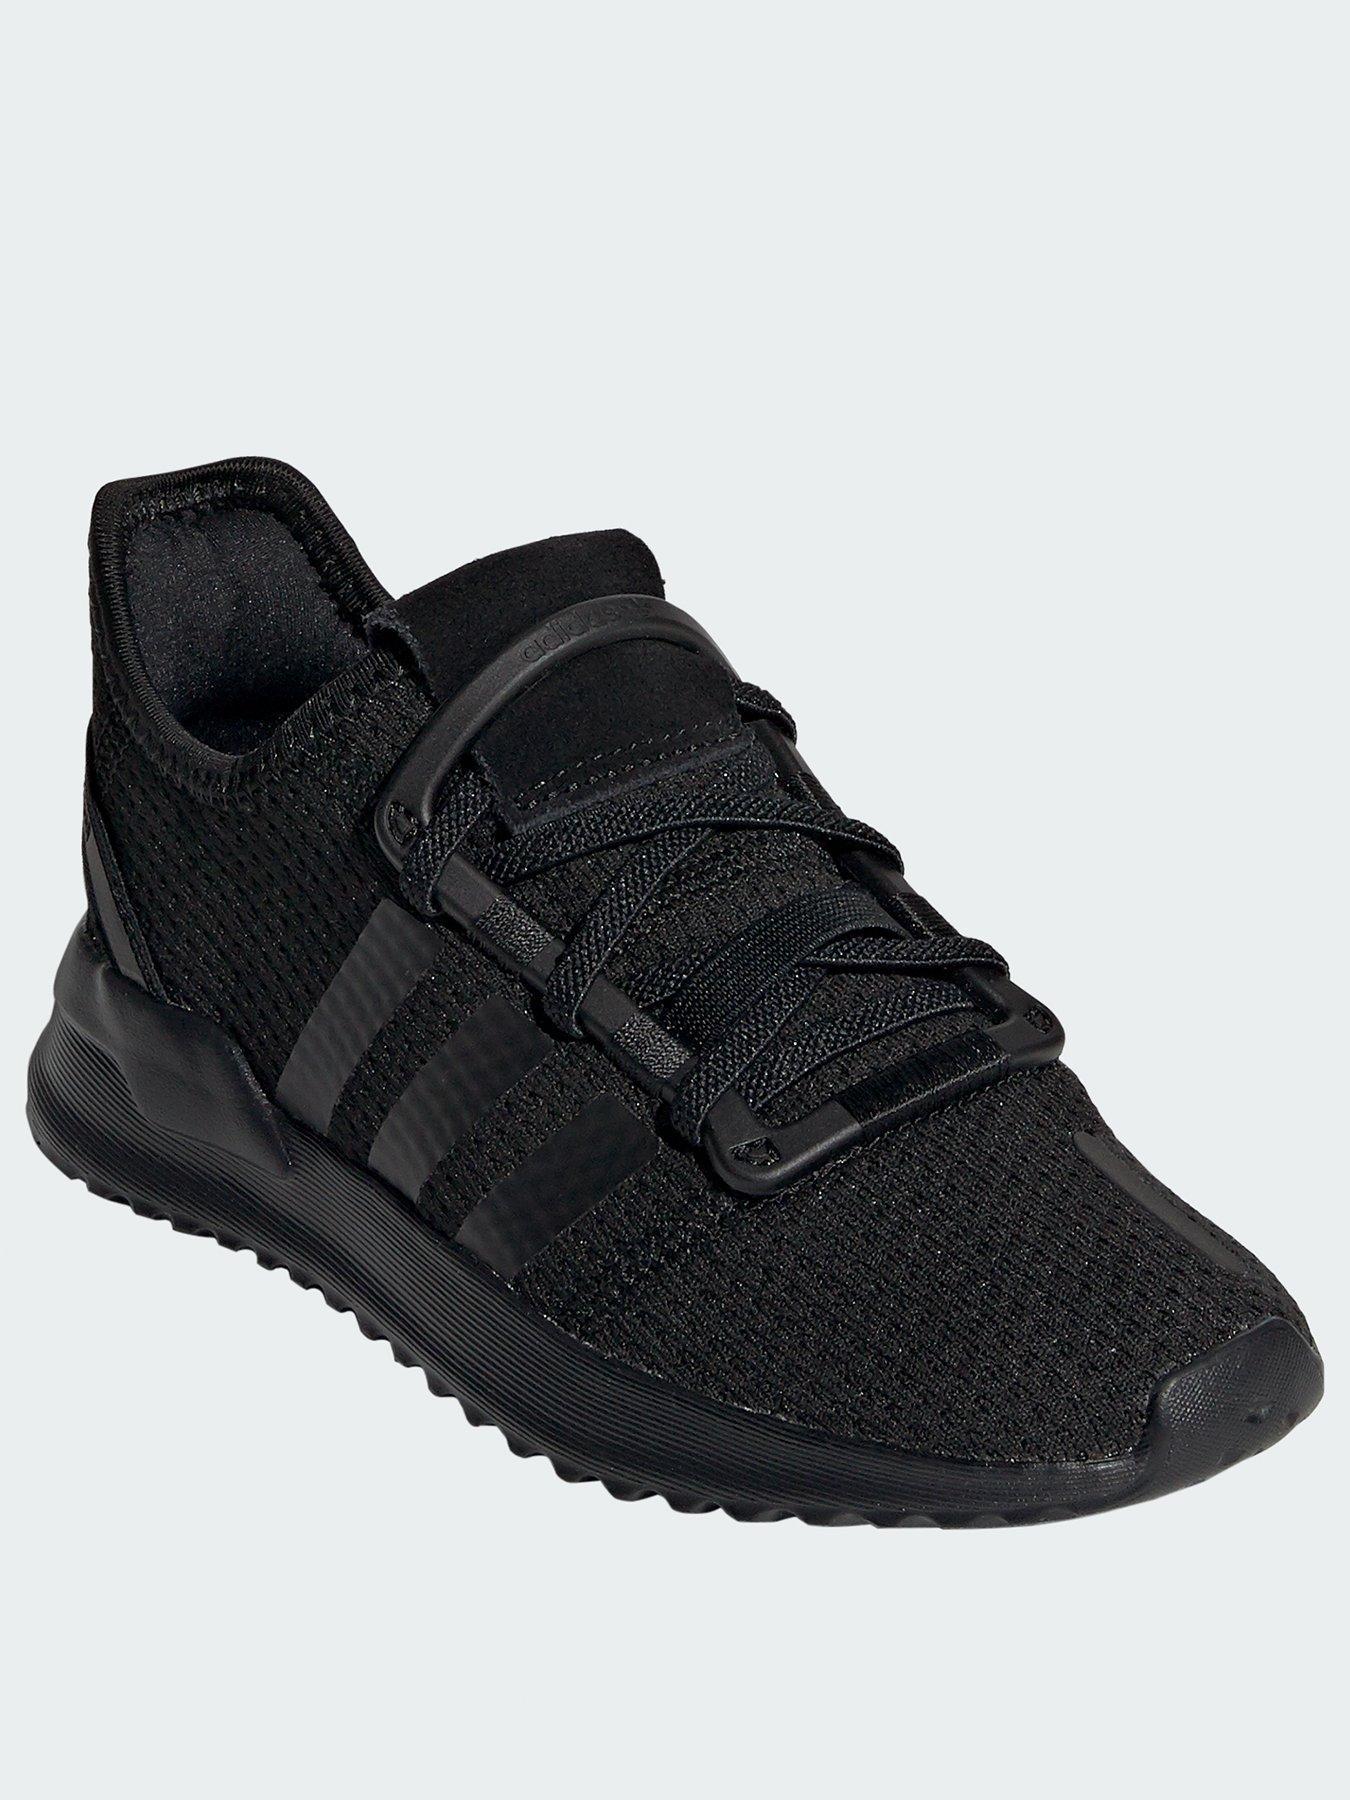 kids black adidas trainers off 58% - www.usushimd.com